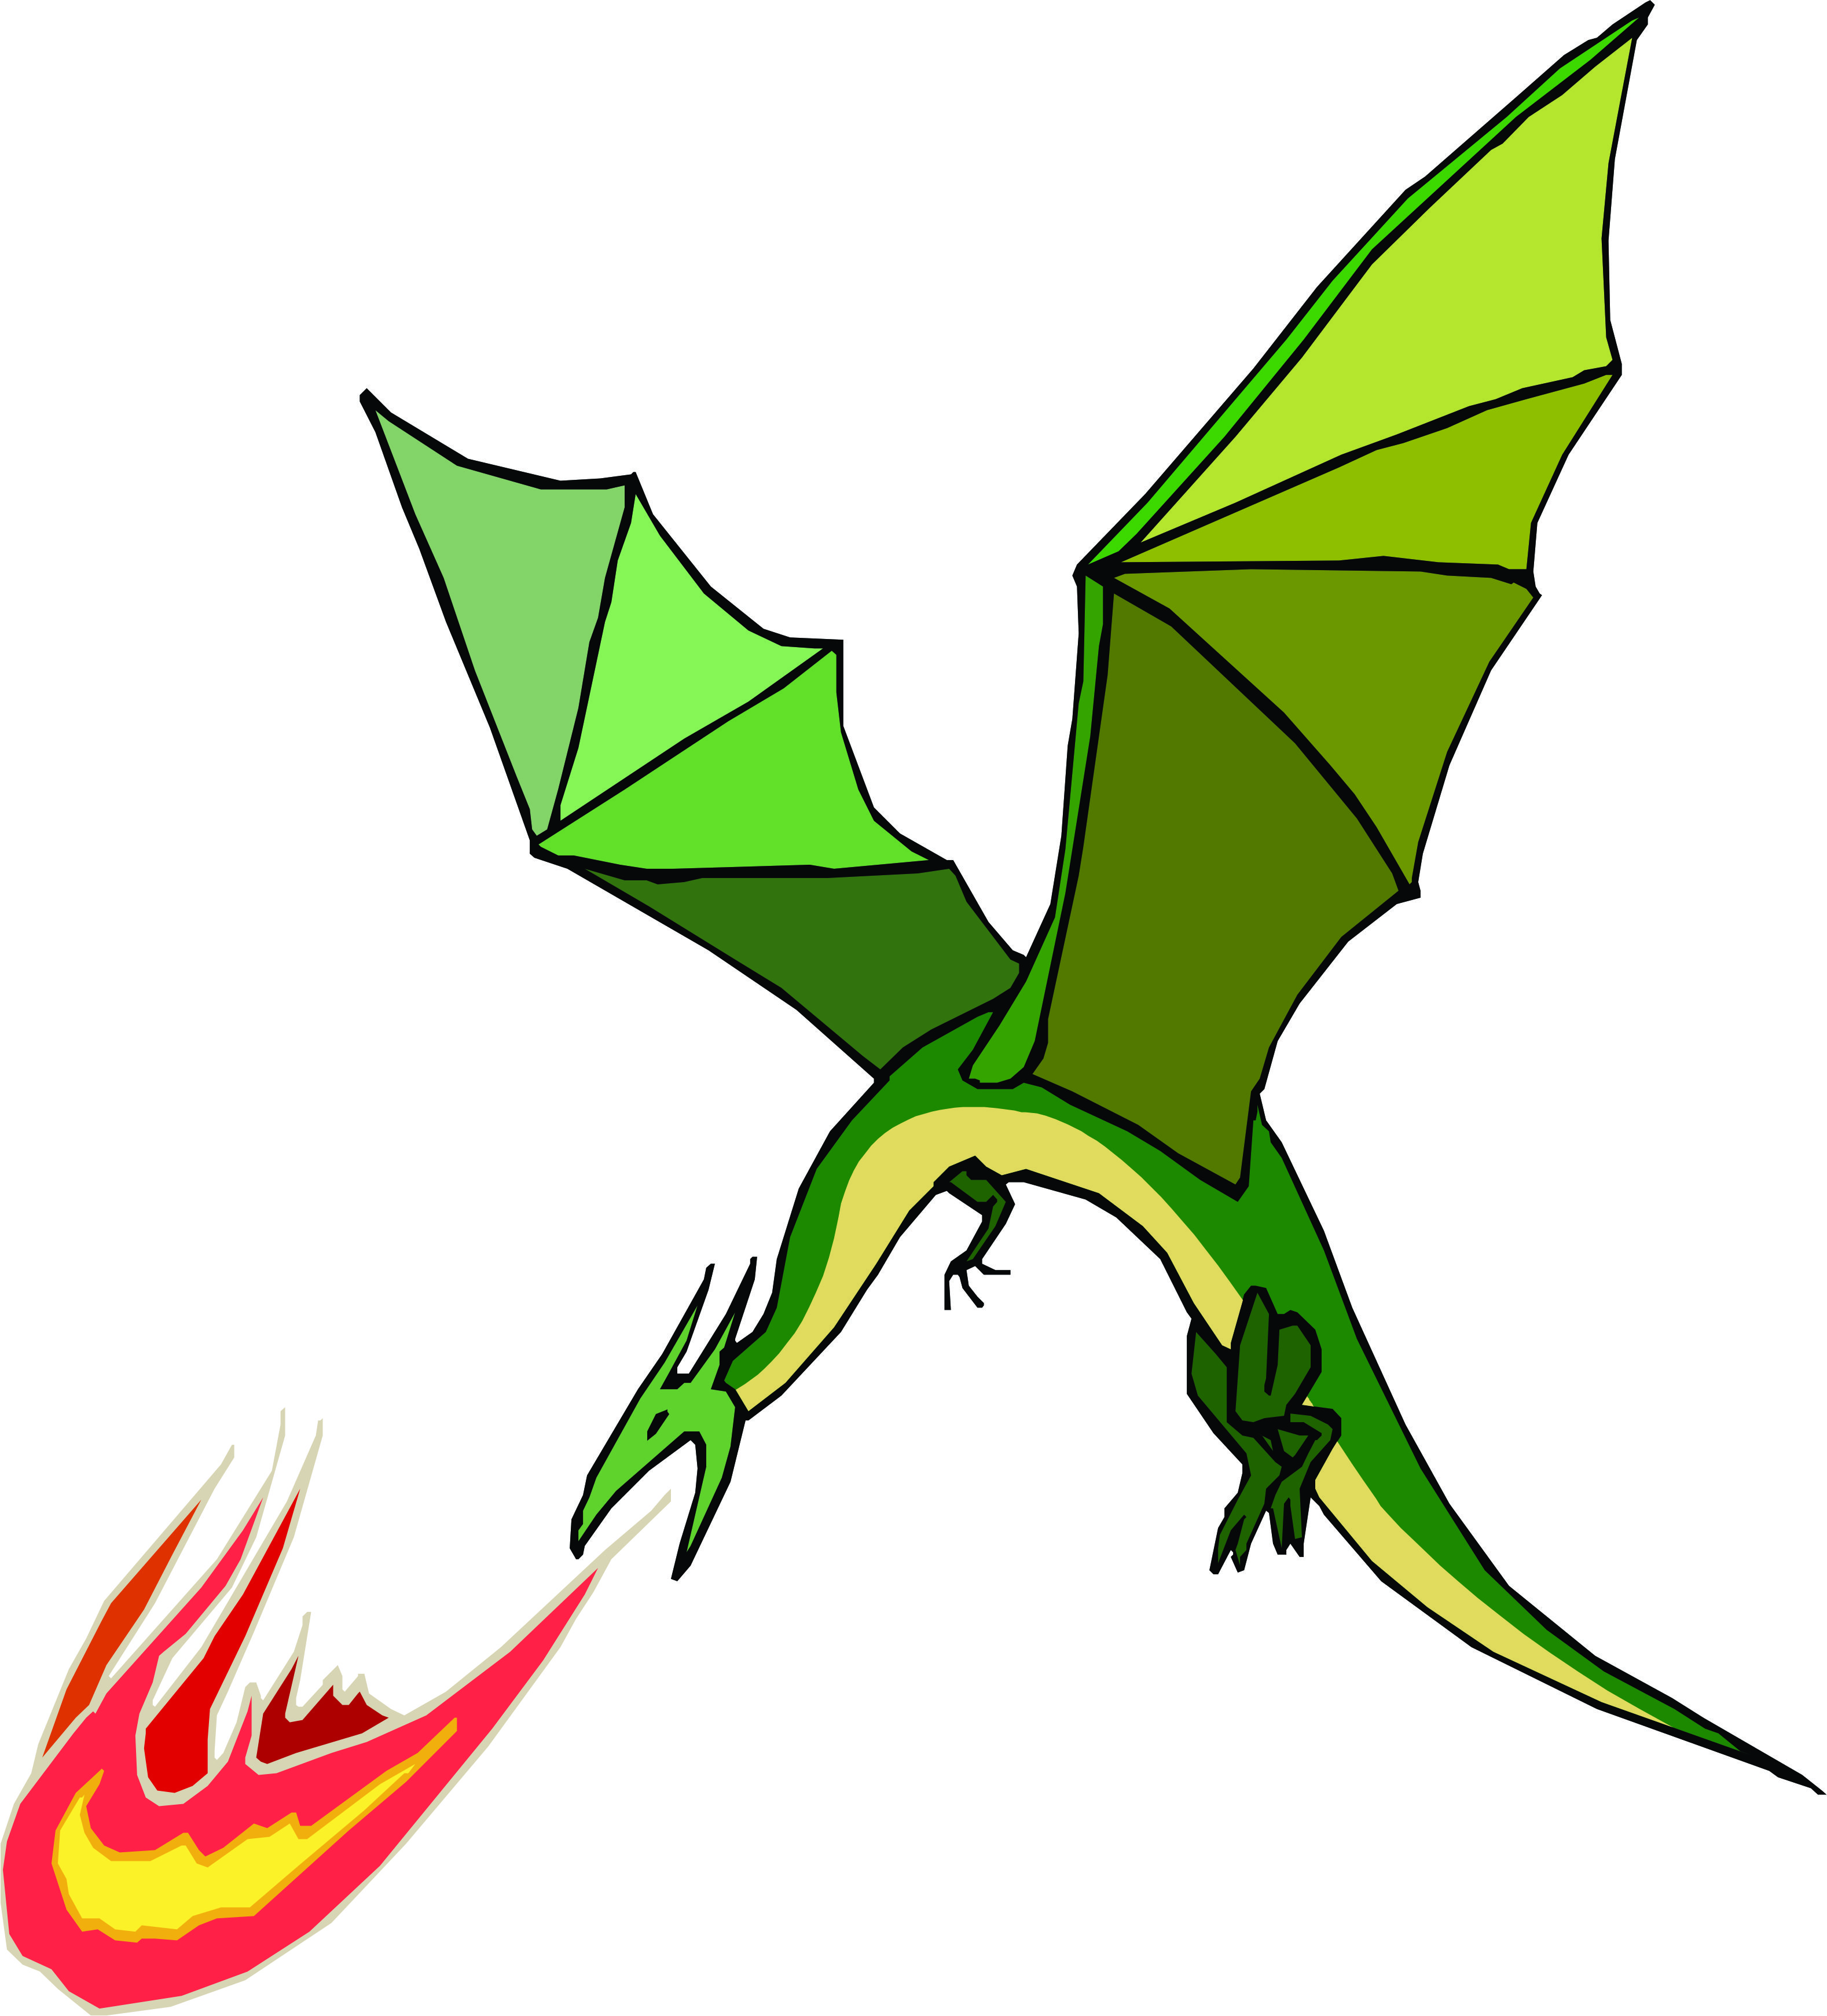 Fire-Breathing Green Dragon Mascot